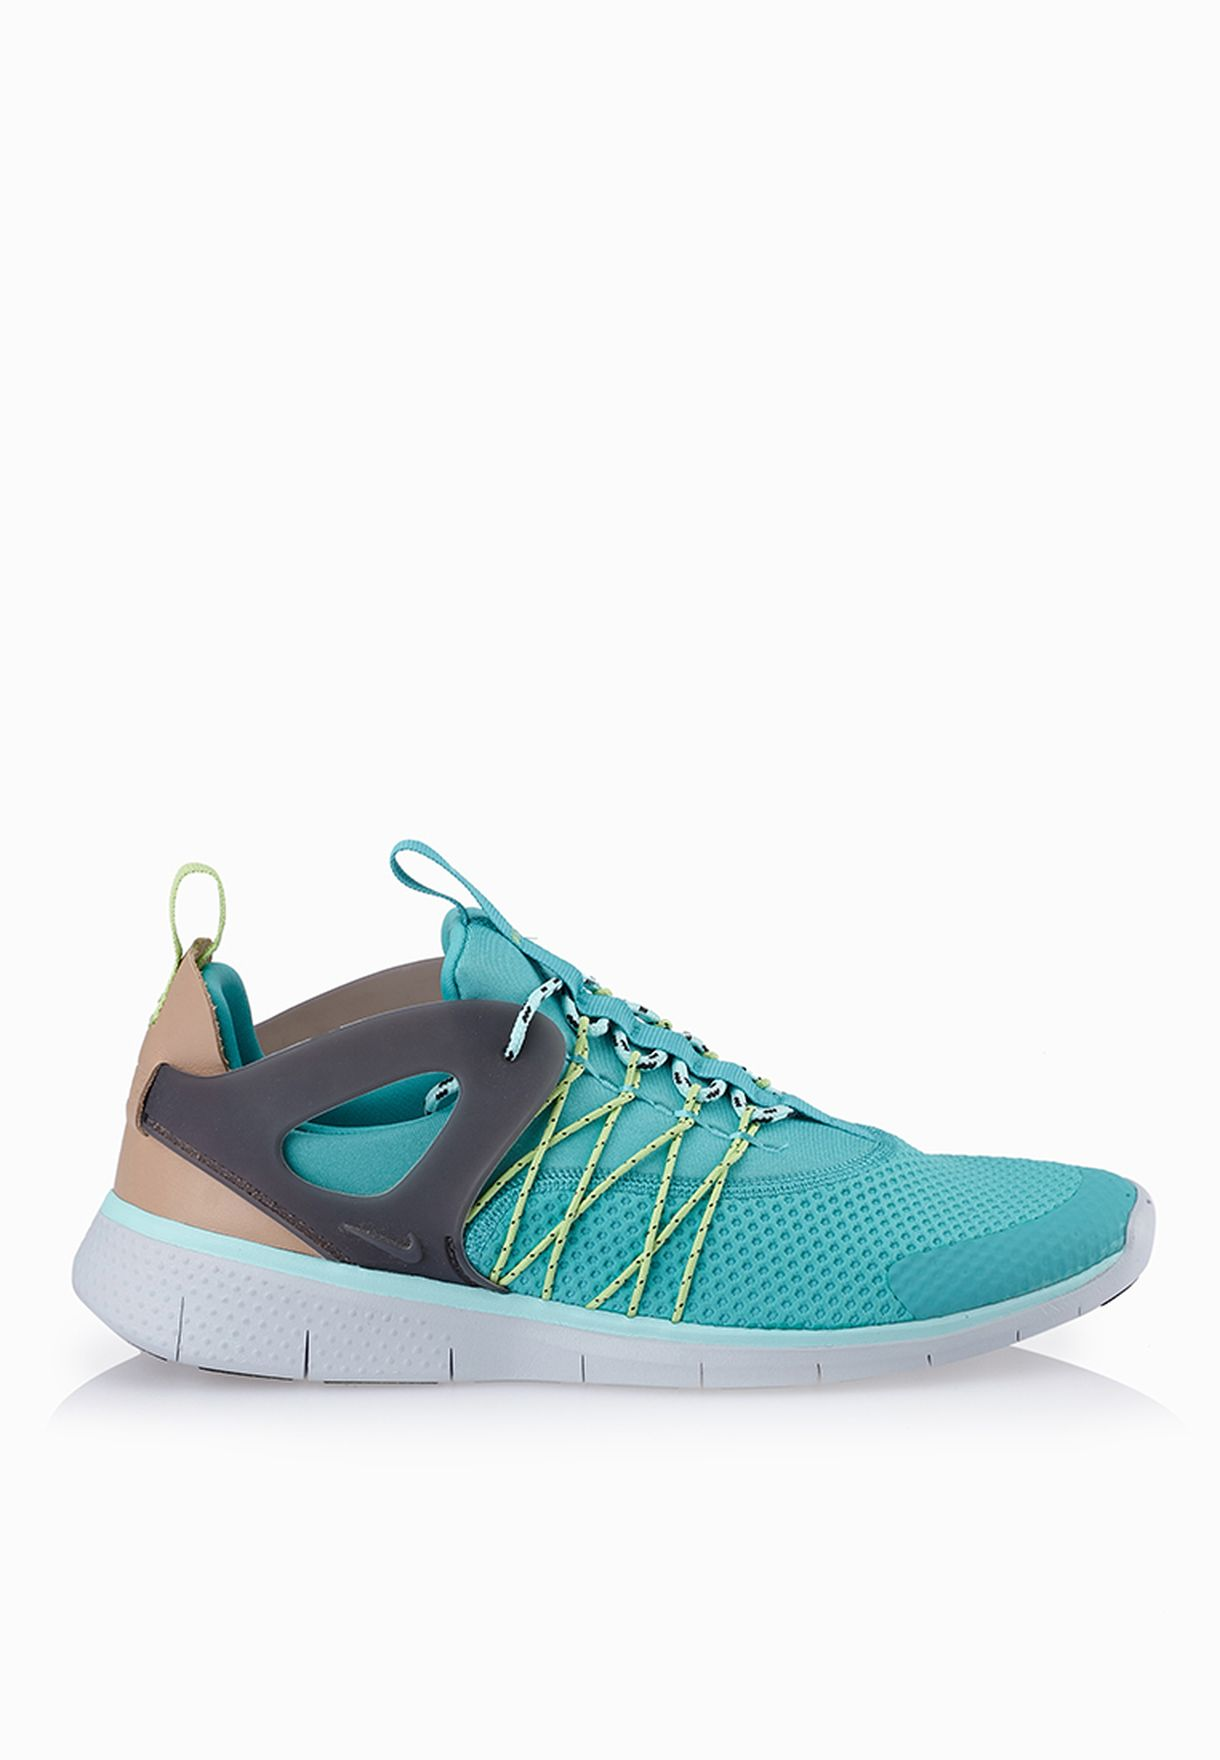 size 40 2430c aded3 Free Viritous Sneakers